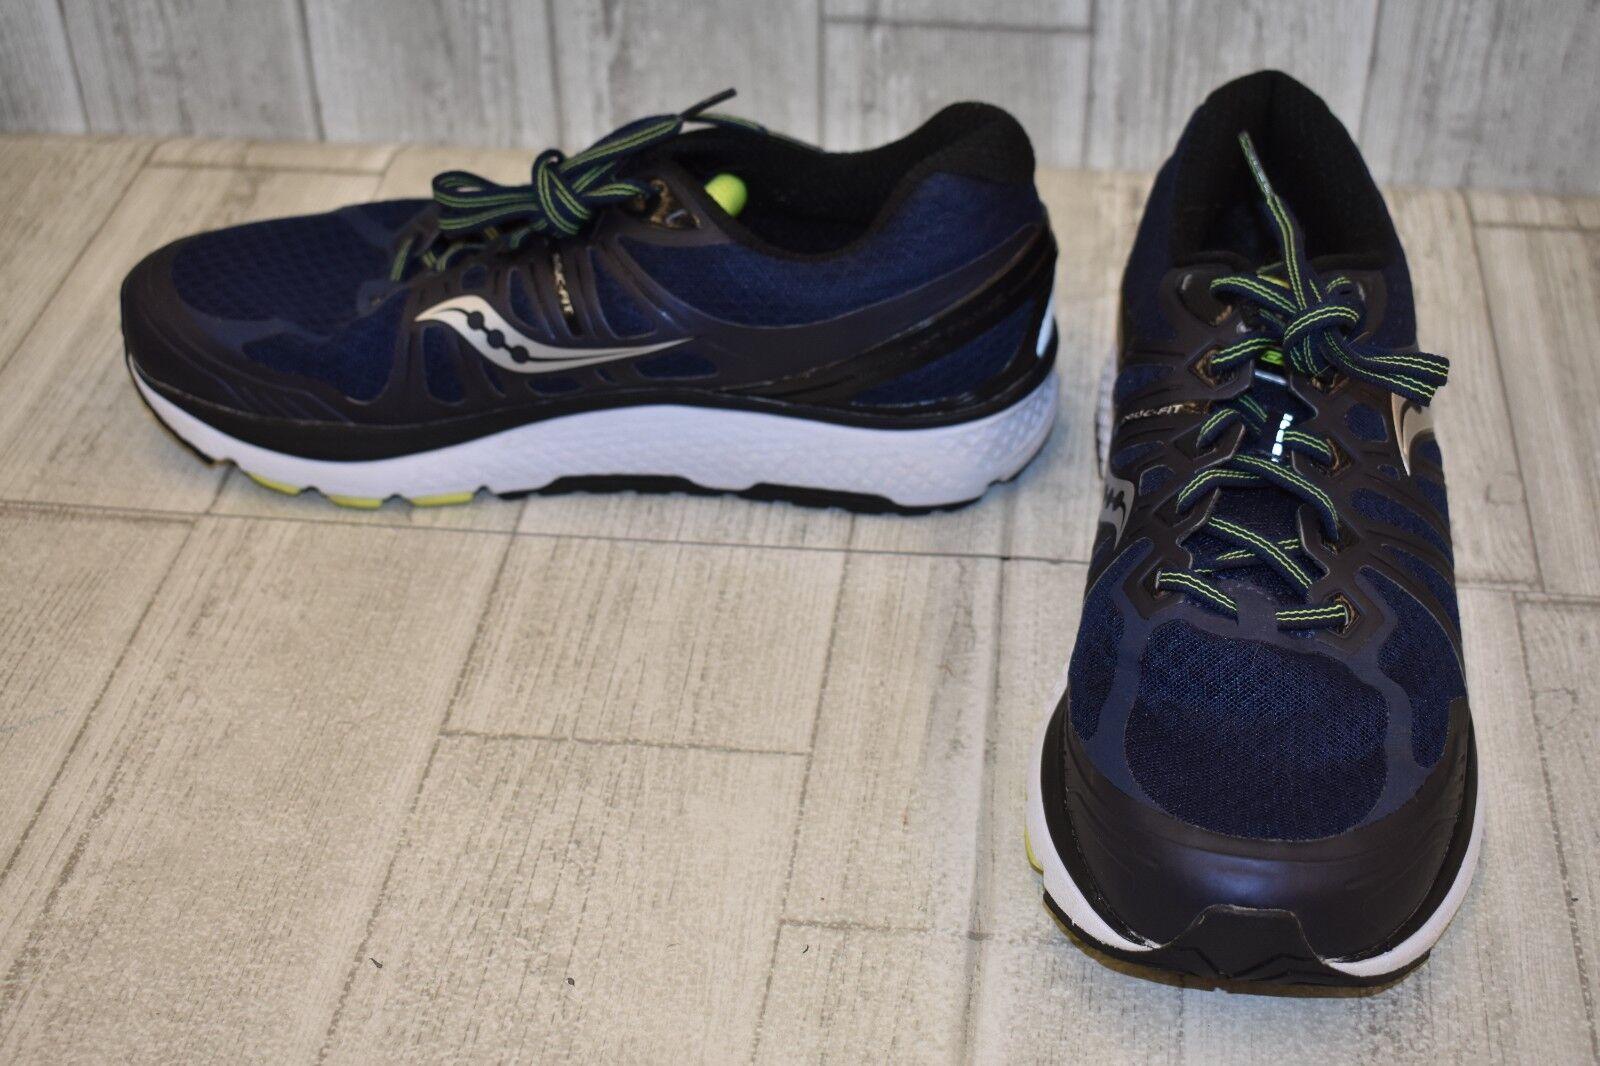 Saucony Echelon 6 Running shoes, Men's Size 11.5, Navy Black Silver